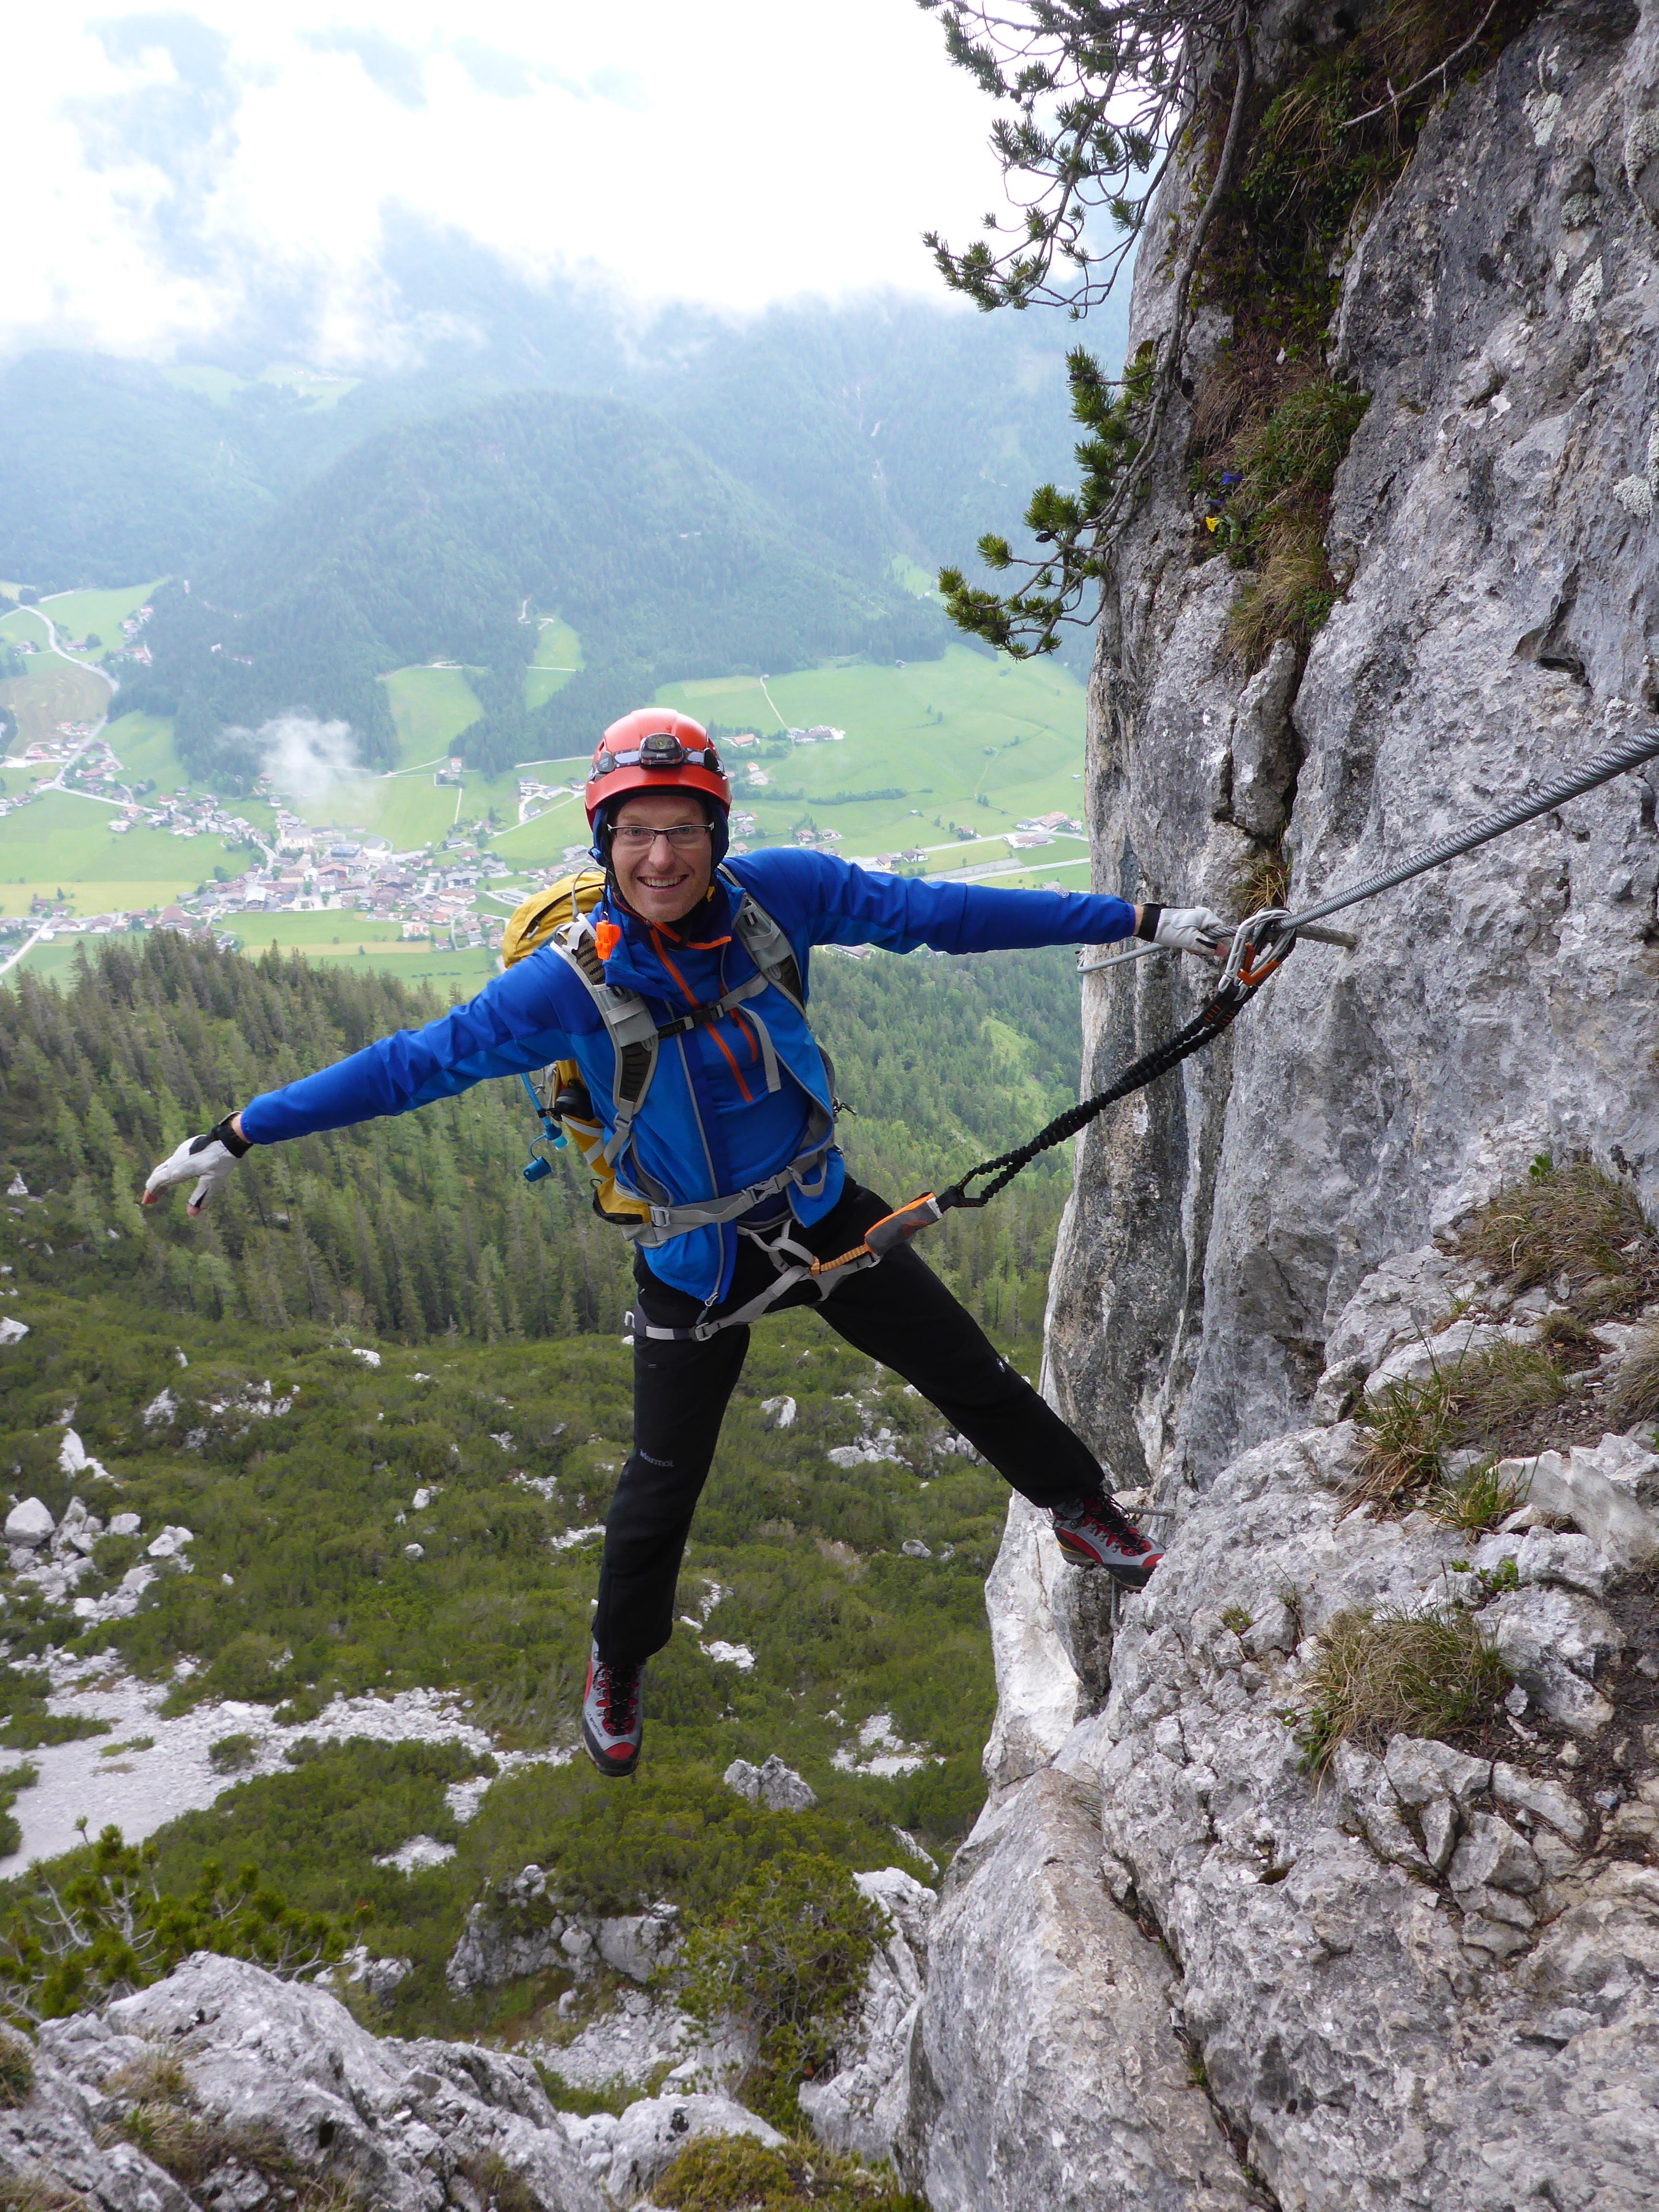 Climber in full gear on Via Ferrata